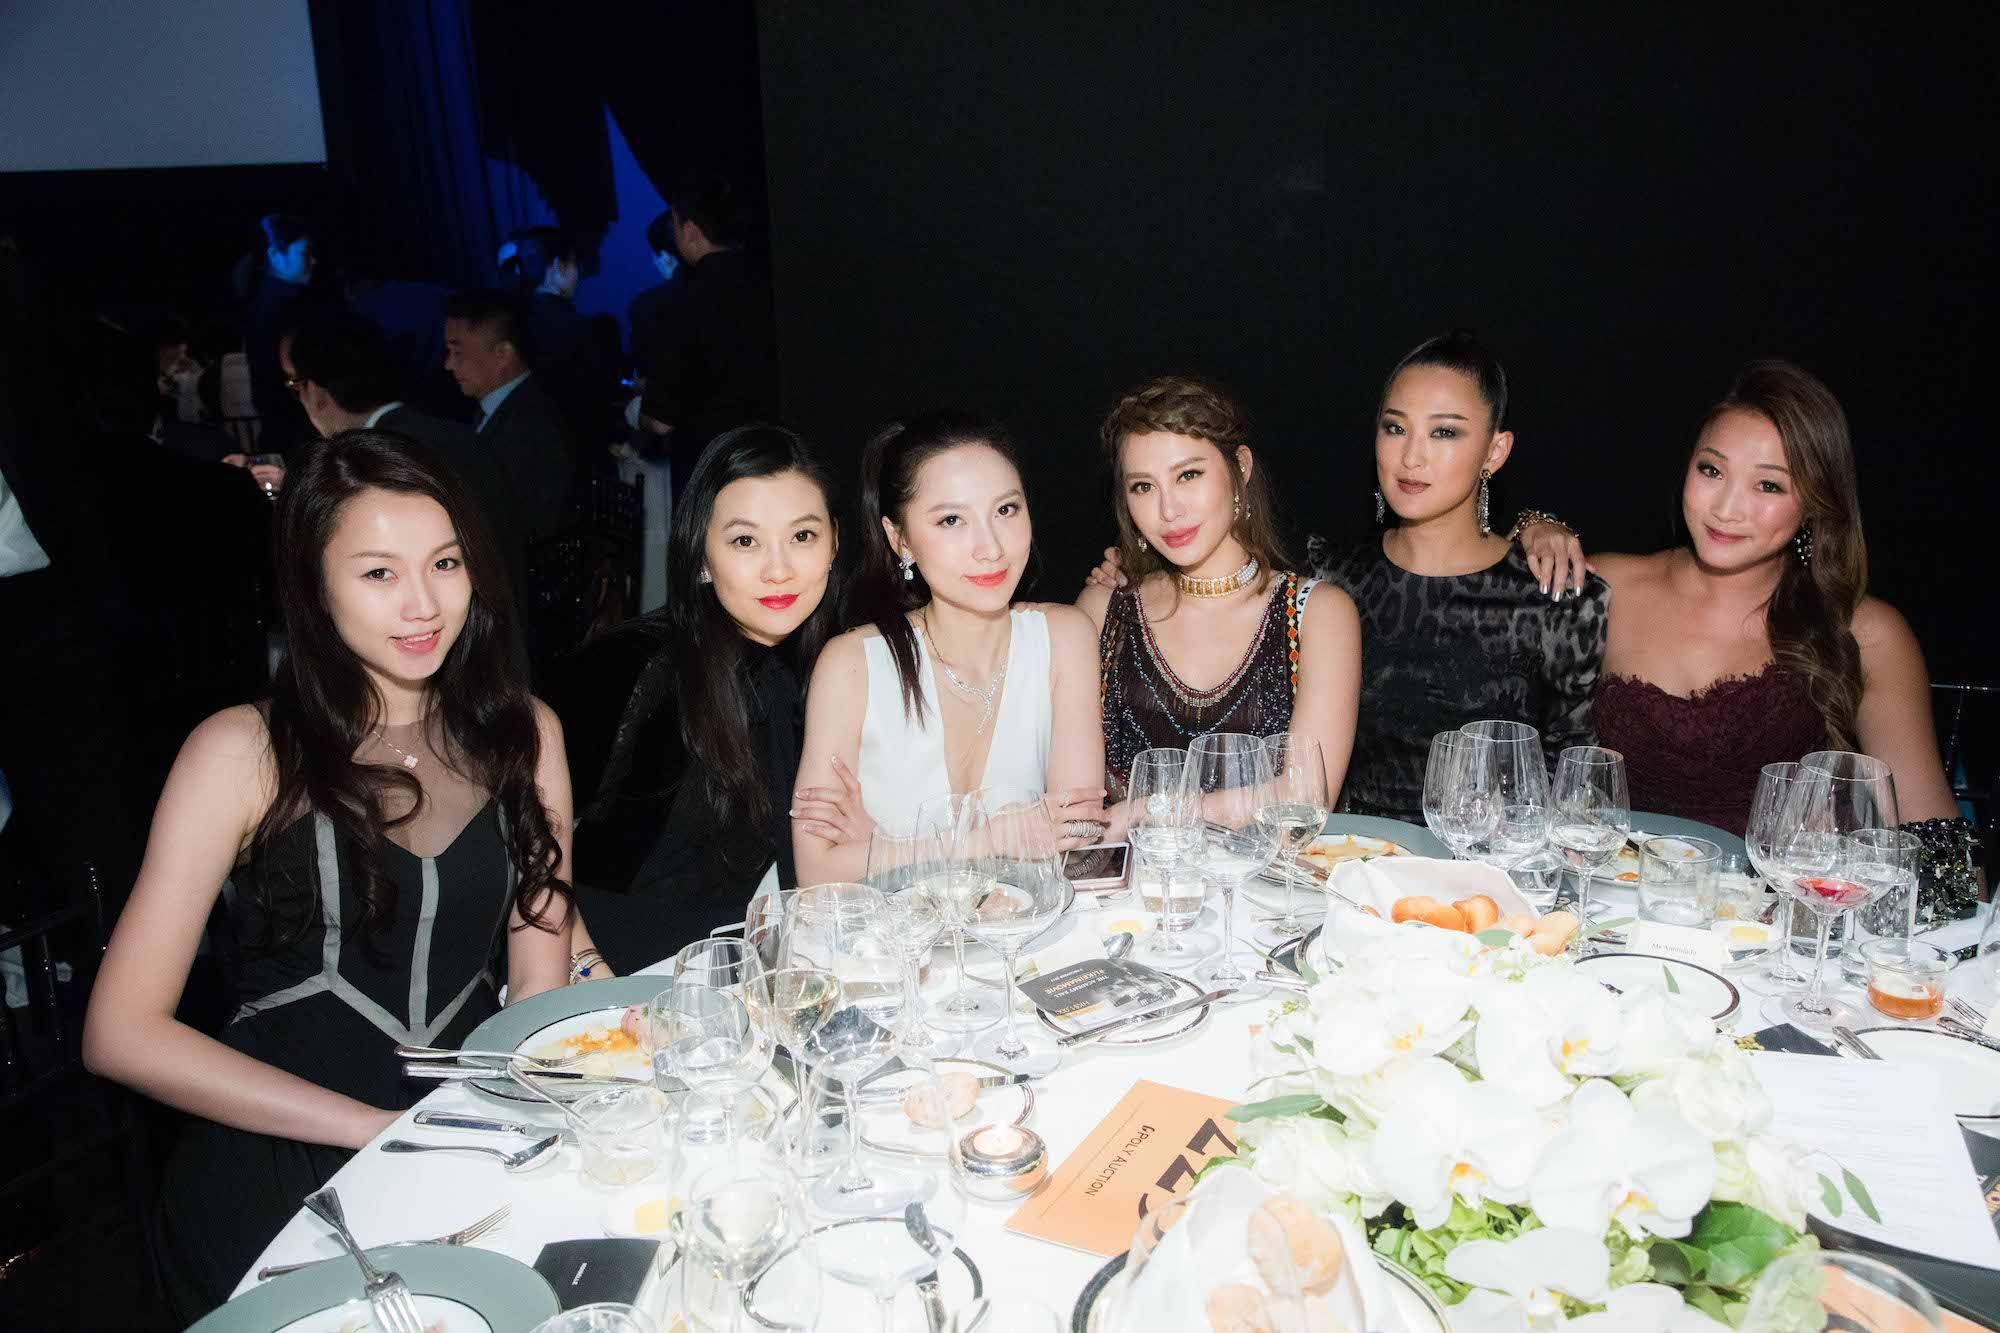 Mercury Kwok, Melissa Zuo, Christine Wan, Eleanor Lam, Antonia Li, Caroline Li